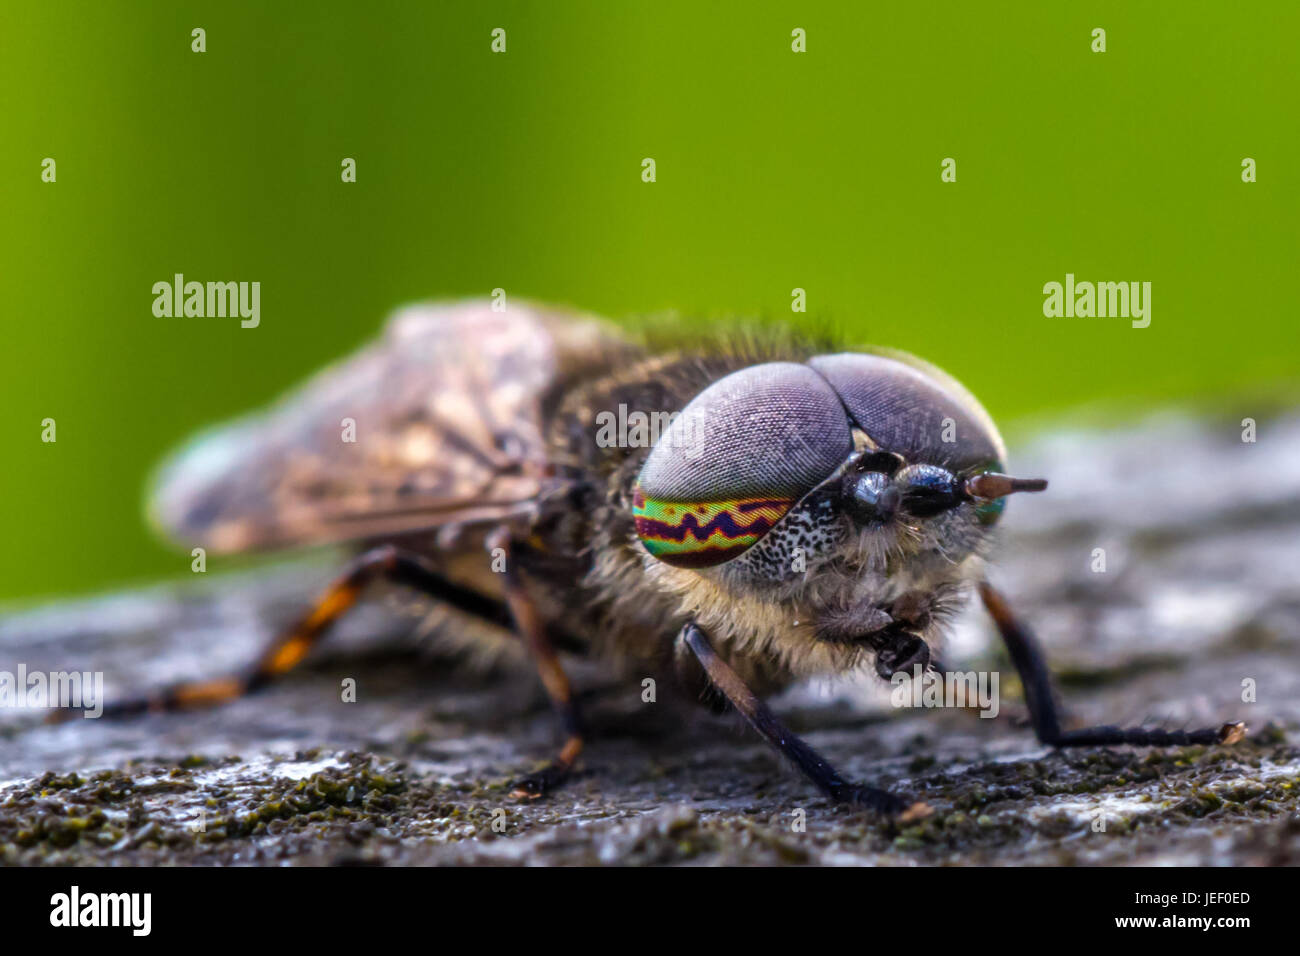 Notch-horned cleg (Haematopota pluvialis), a type of horsefly - amazing close up of beautiful compound eye markings, - Stock Image